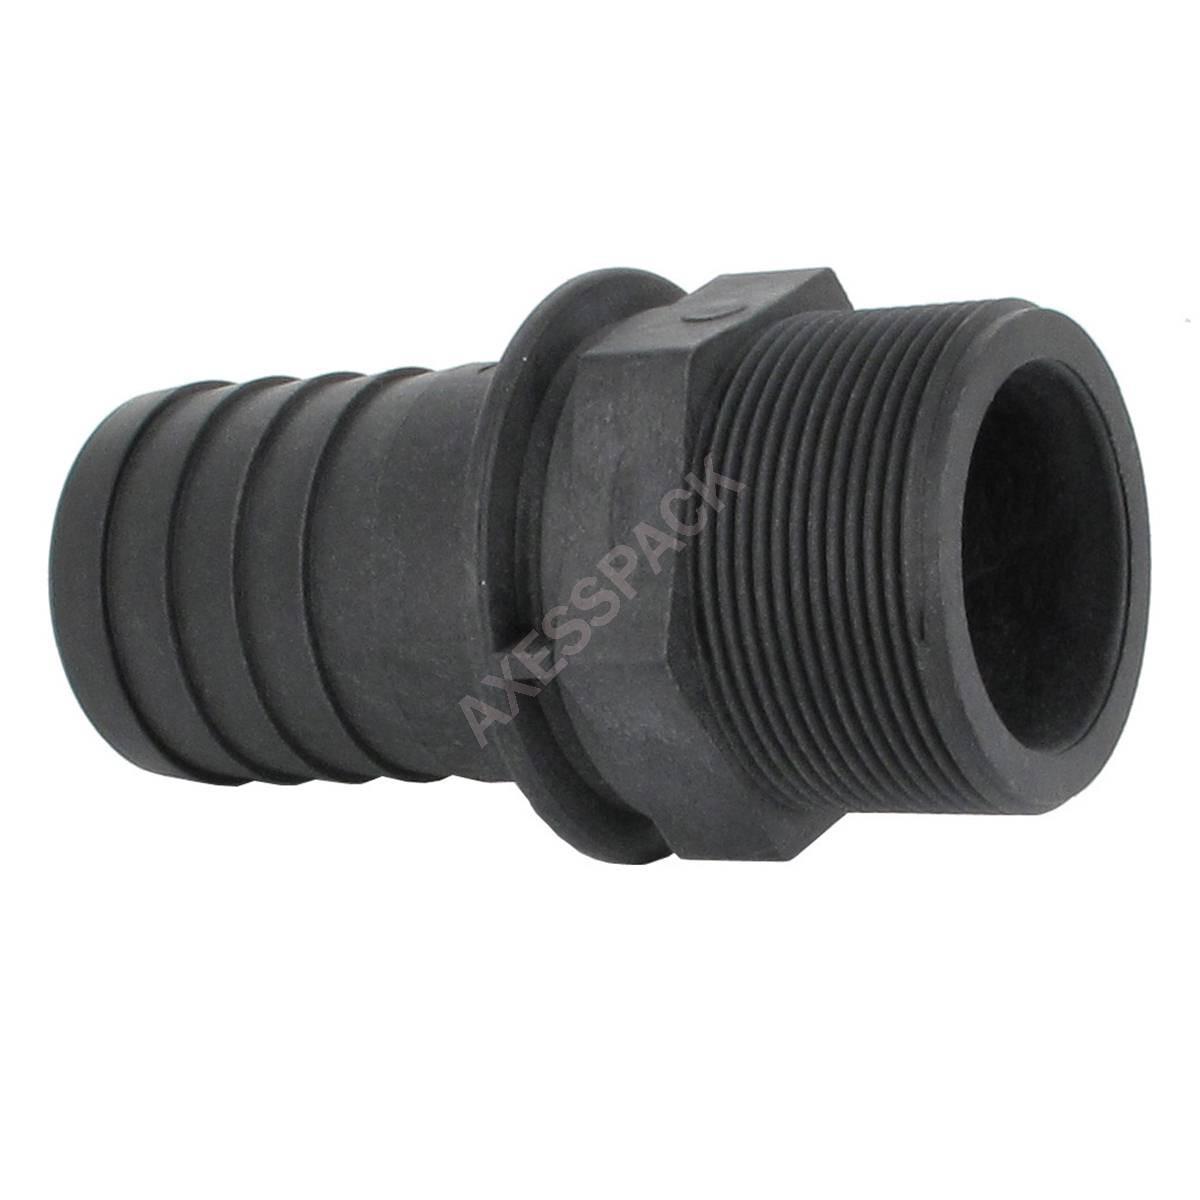 "Hose tail coupler - straight - Male 2"" BSP - hose tail Ø50 mm - PP"